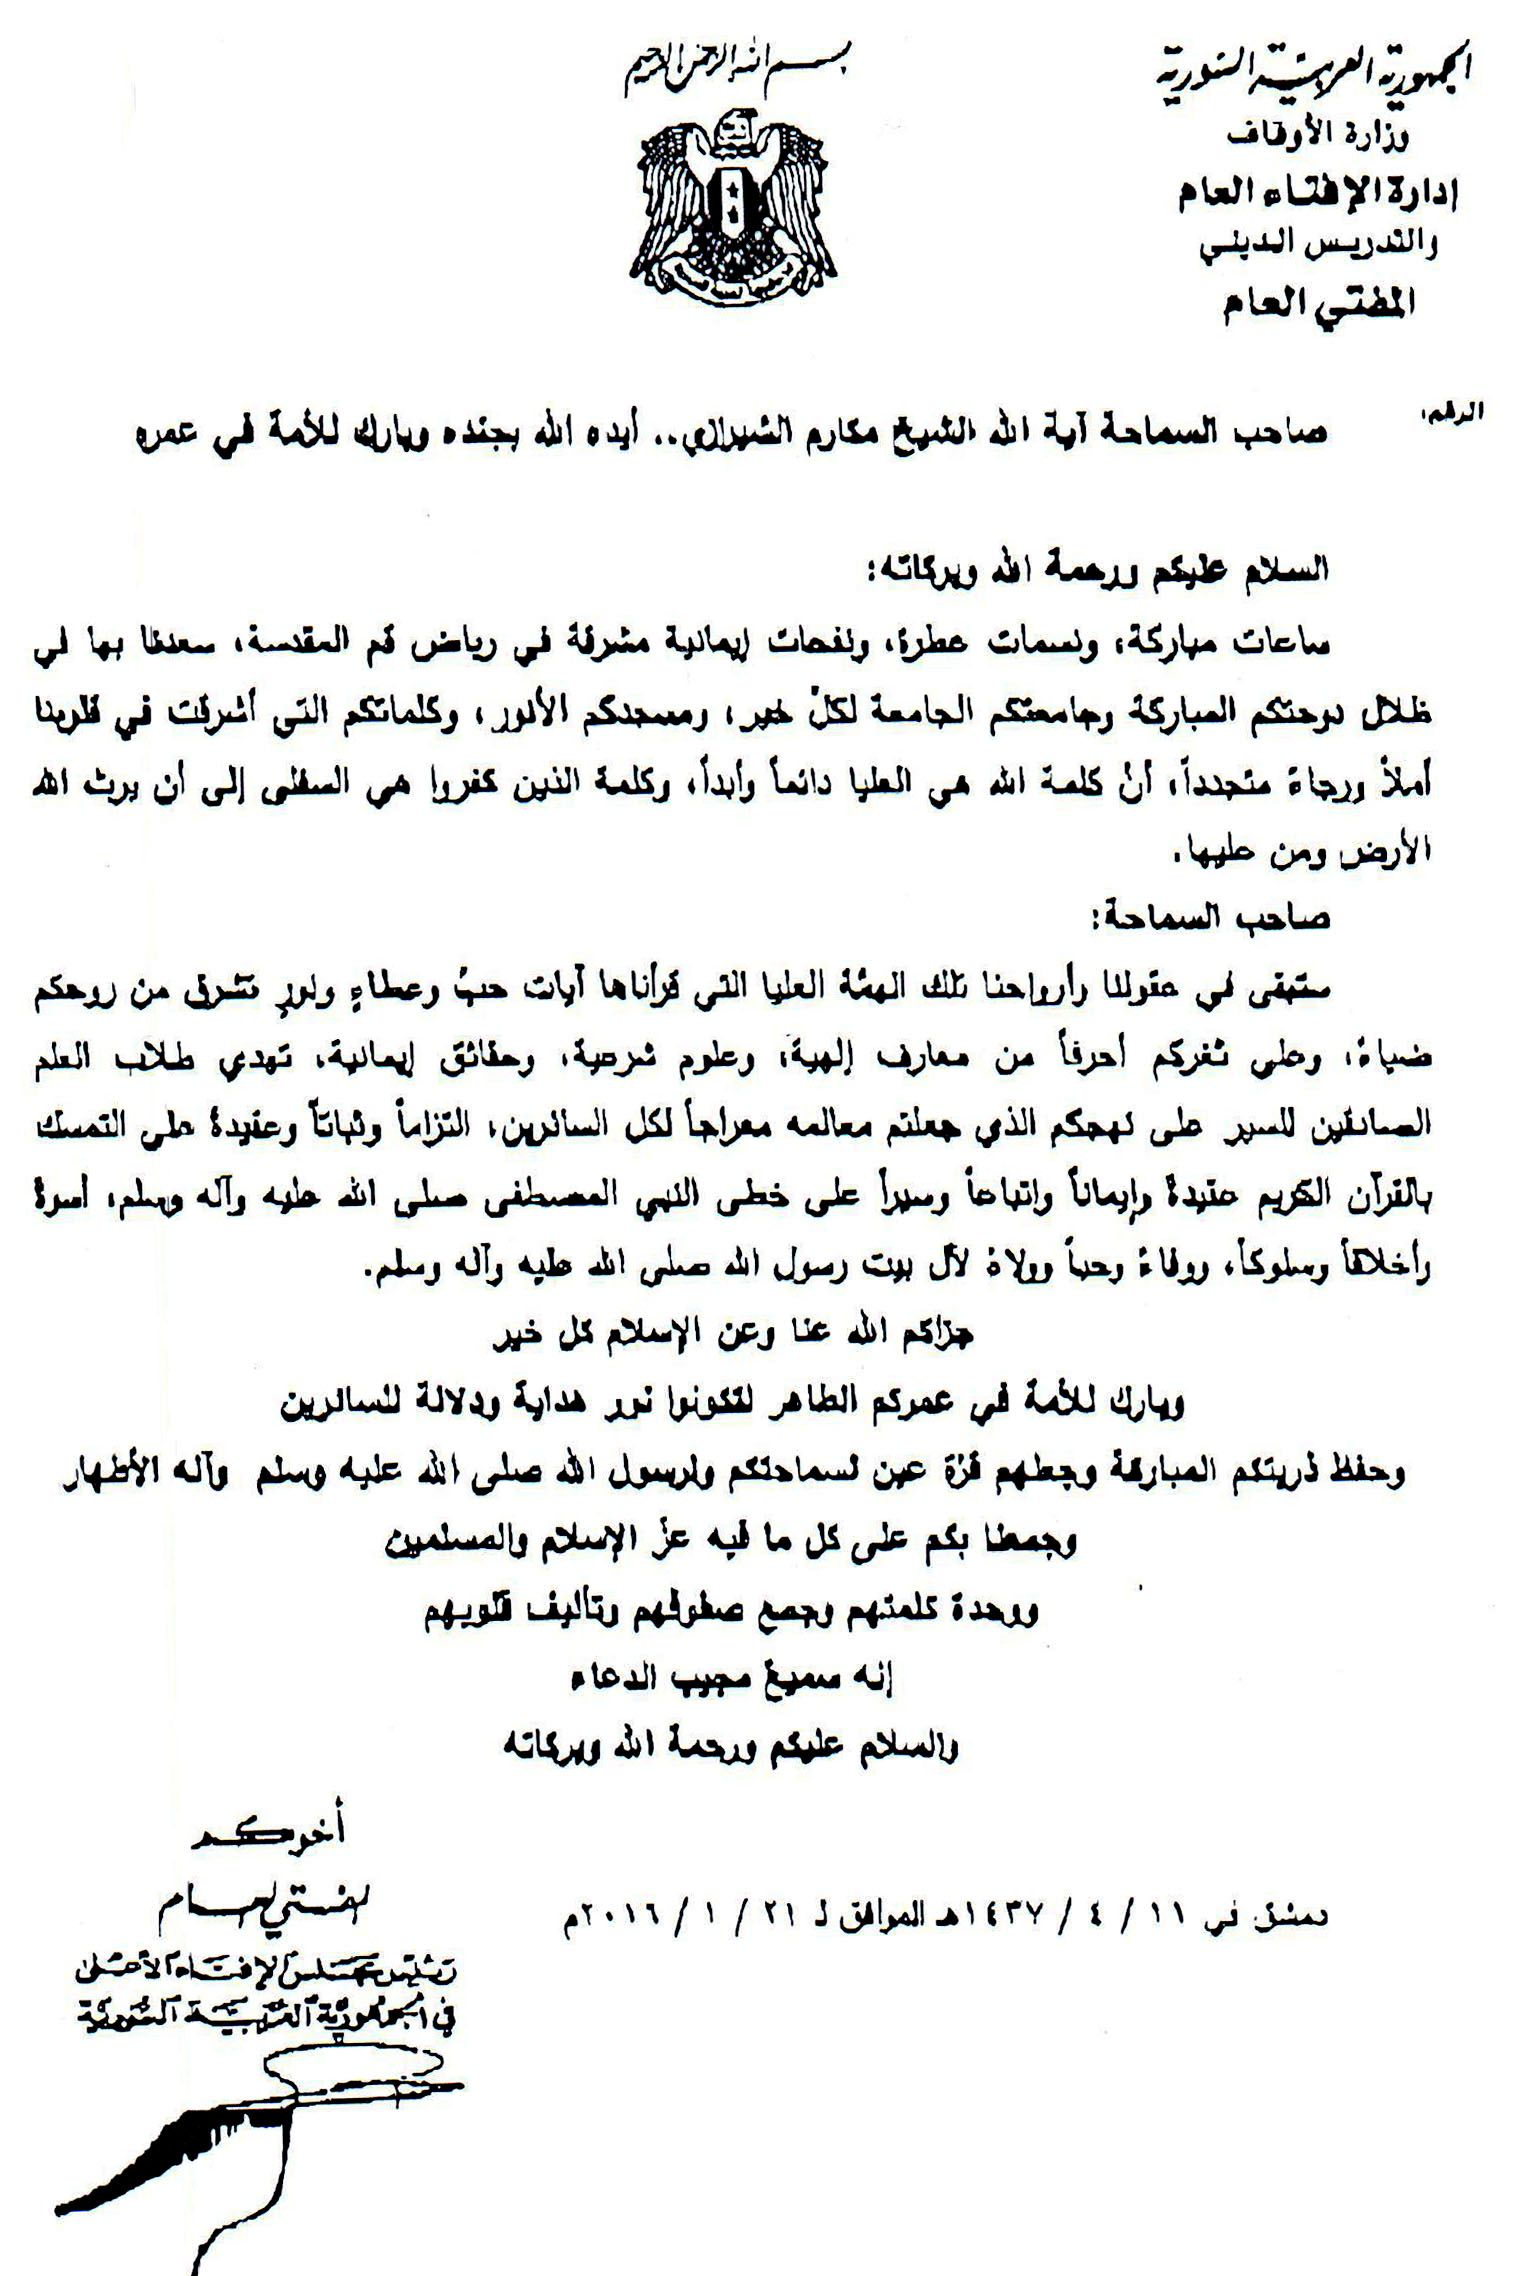 مفتی اعظم سوریه شیخ احمد بدرالدین حسون-مدرسه الامام امیر المومنین (ع)